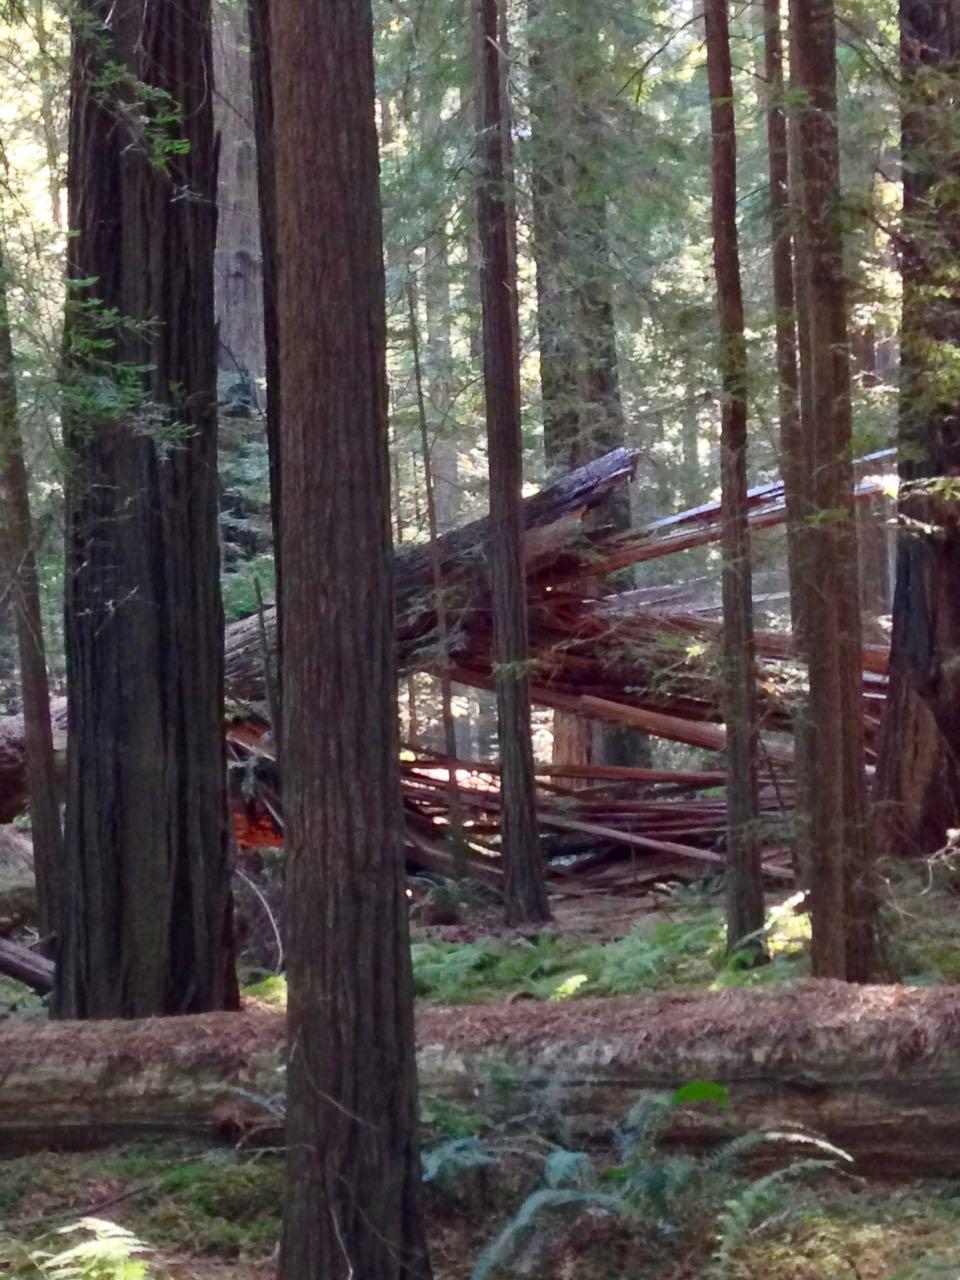 Redwoods 2017 10 08 20 Of 287